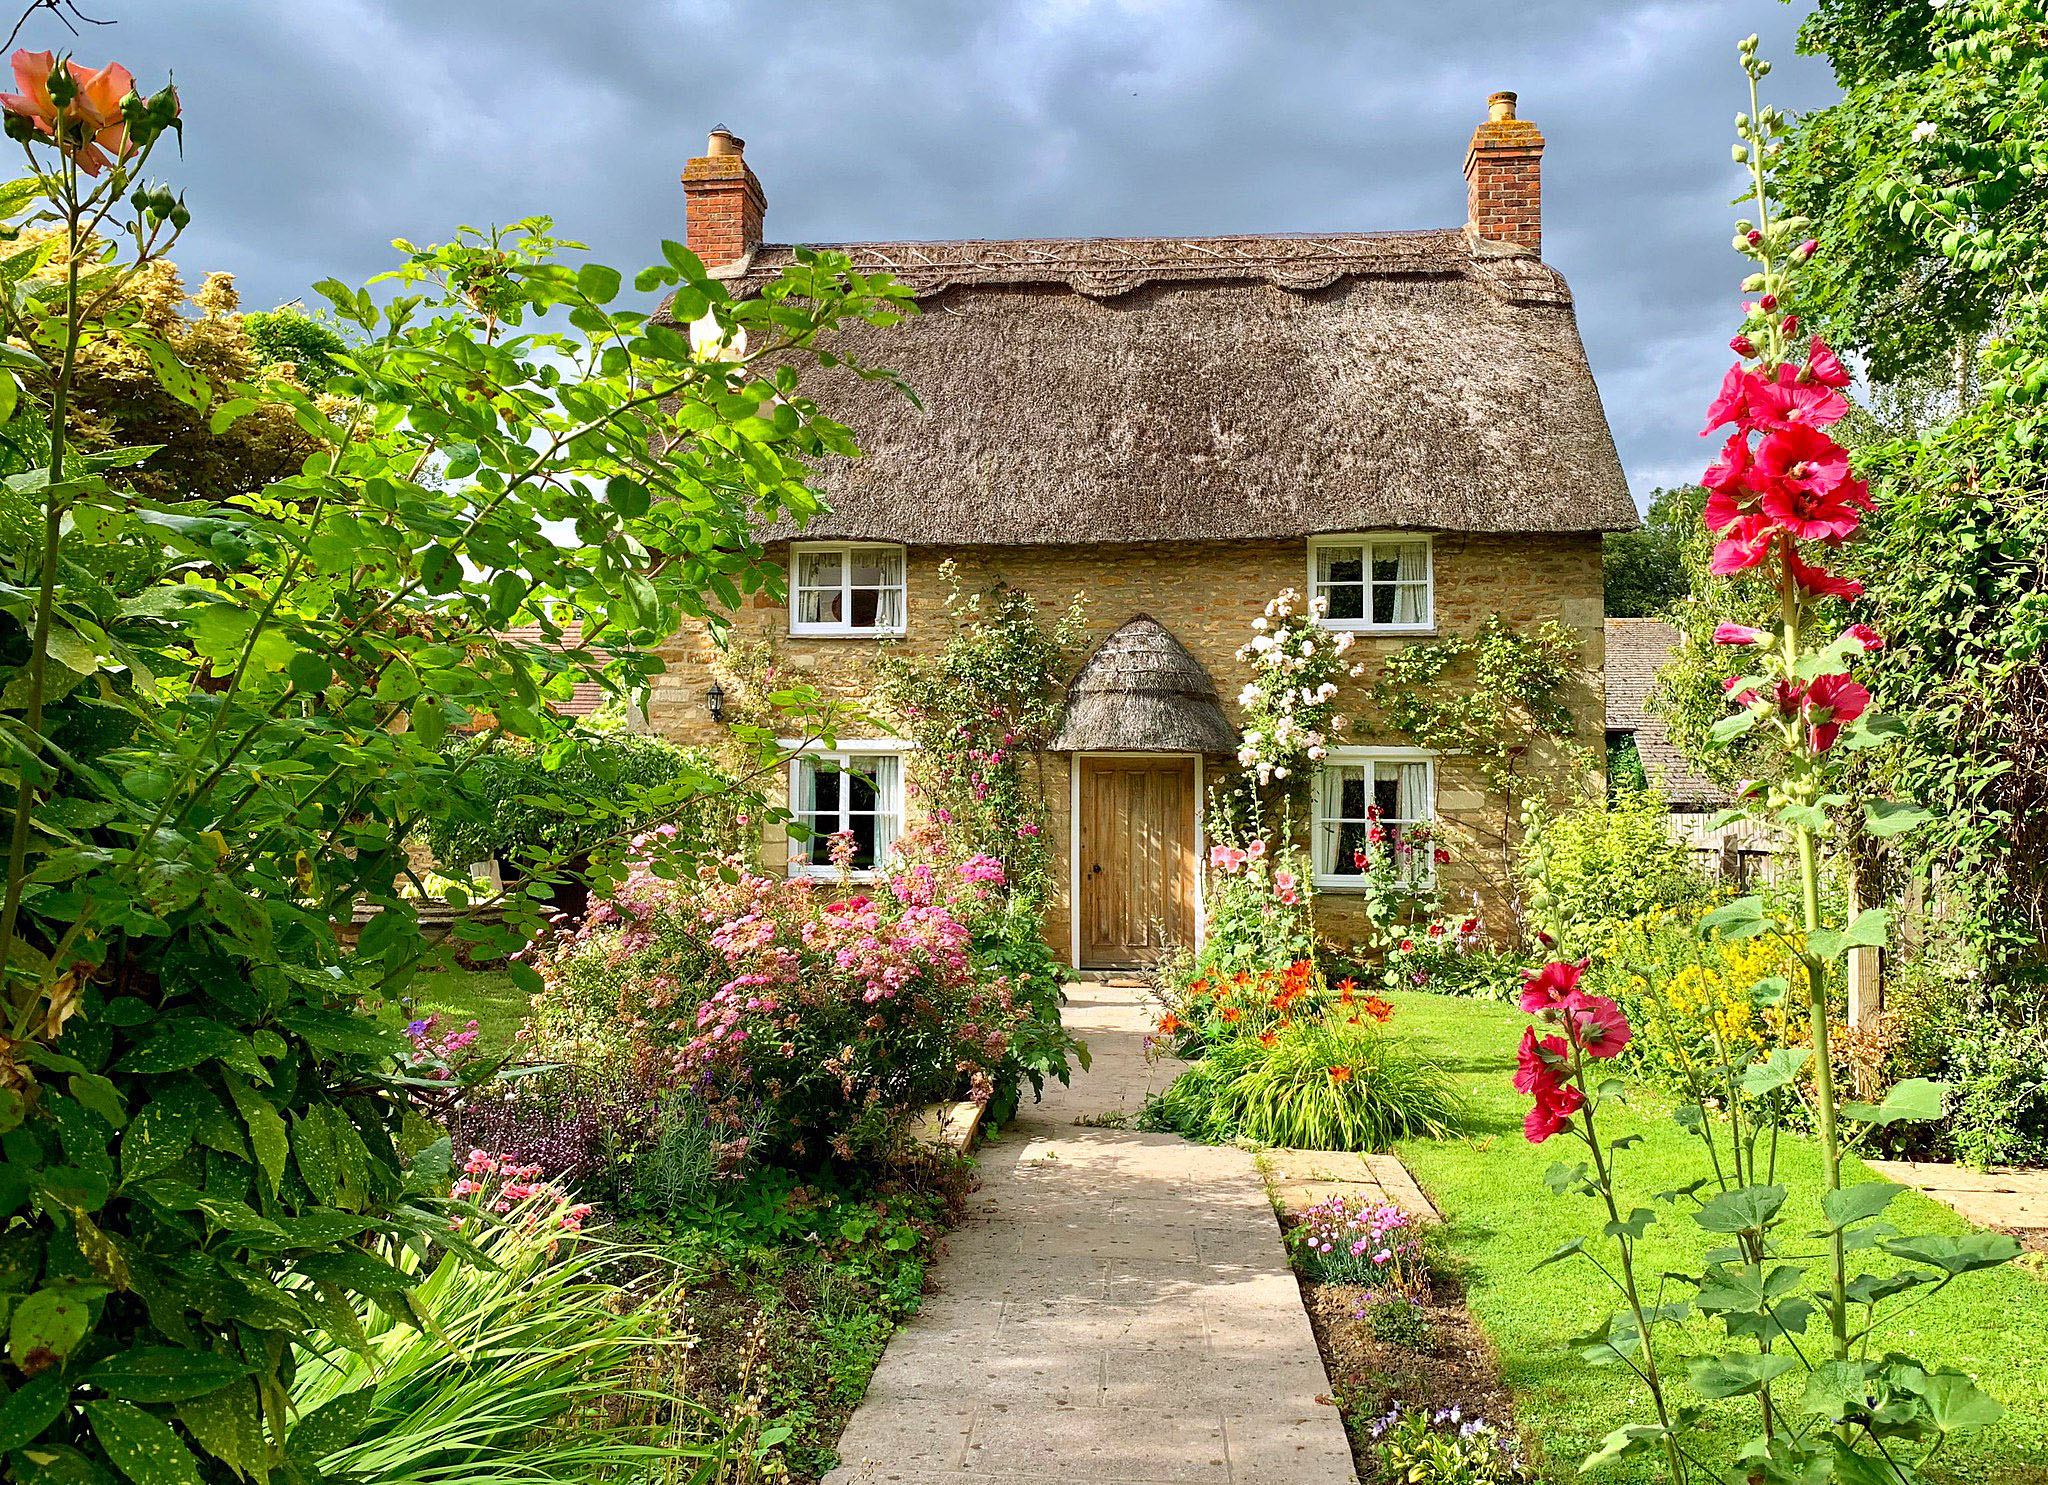 Thatched Cottage, Hambleton, Rutland by Nigel Harris.jpg